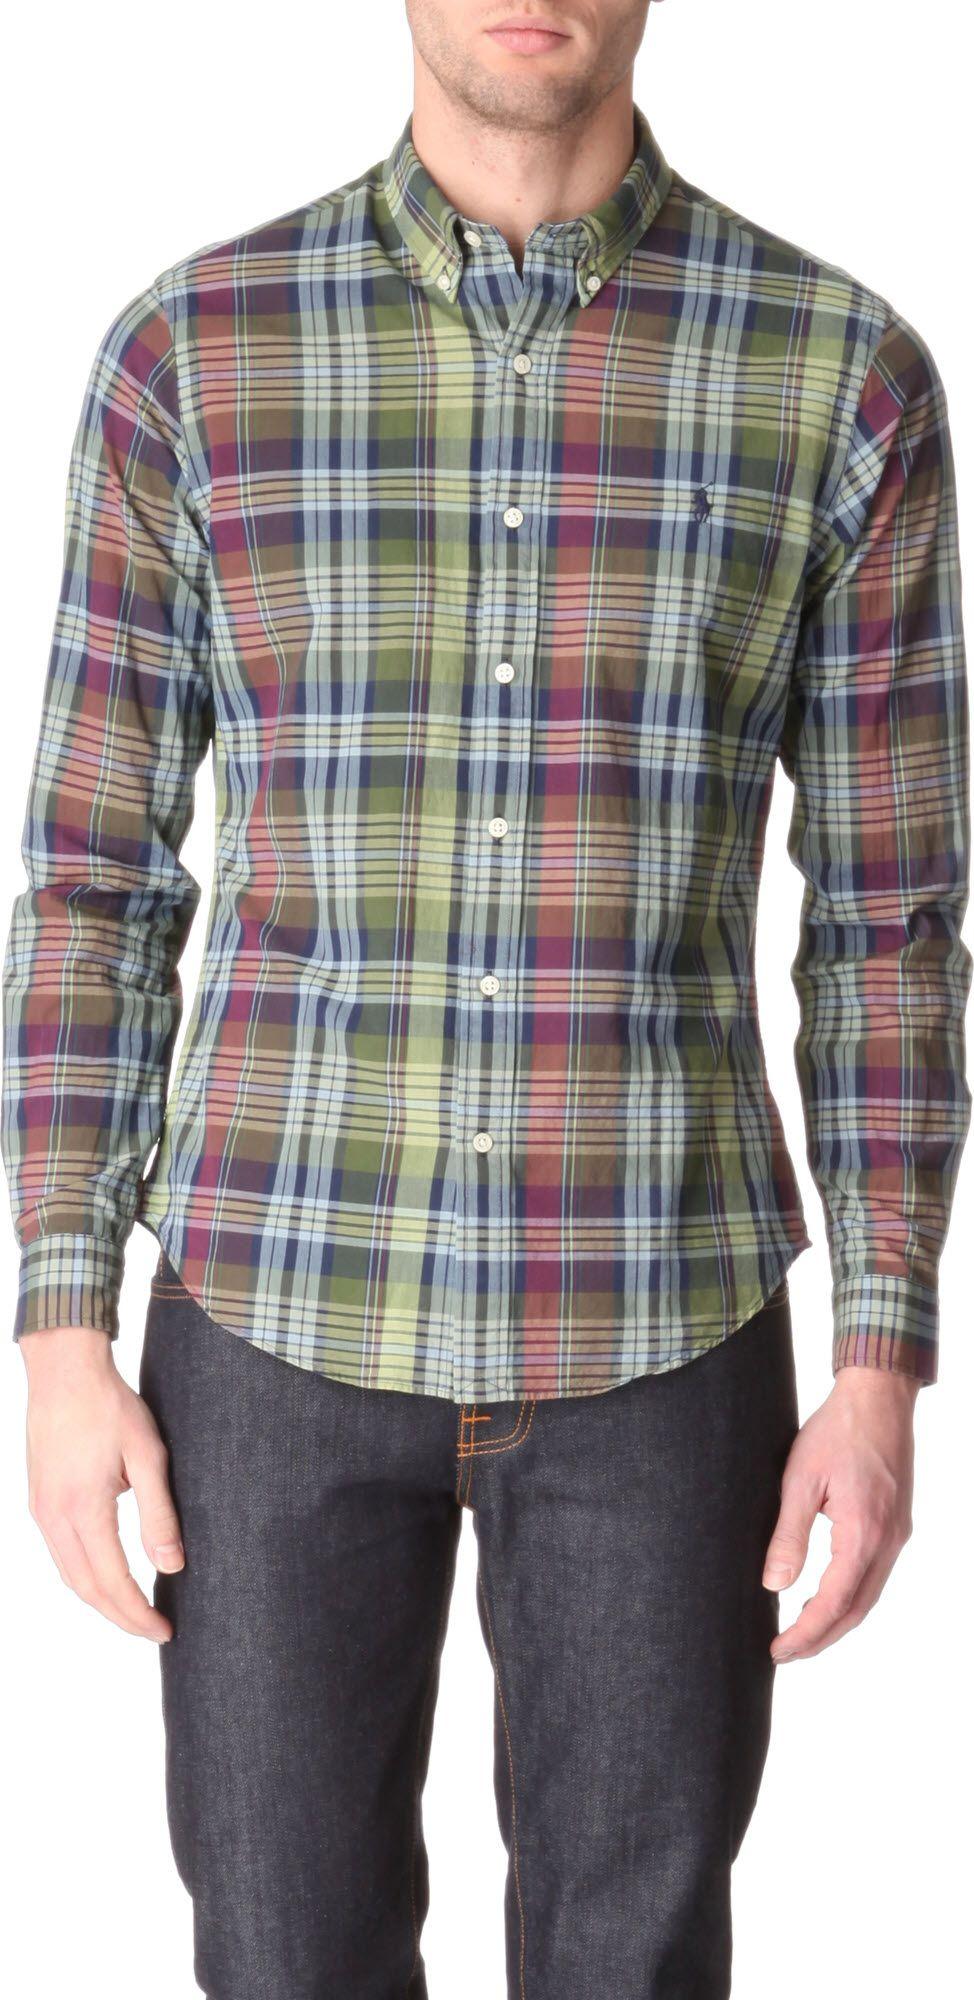 Ralph lauren plaid slimfit single cuff shirt in multicolor for Single cuff dress shirt